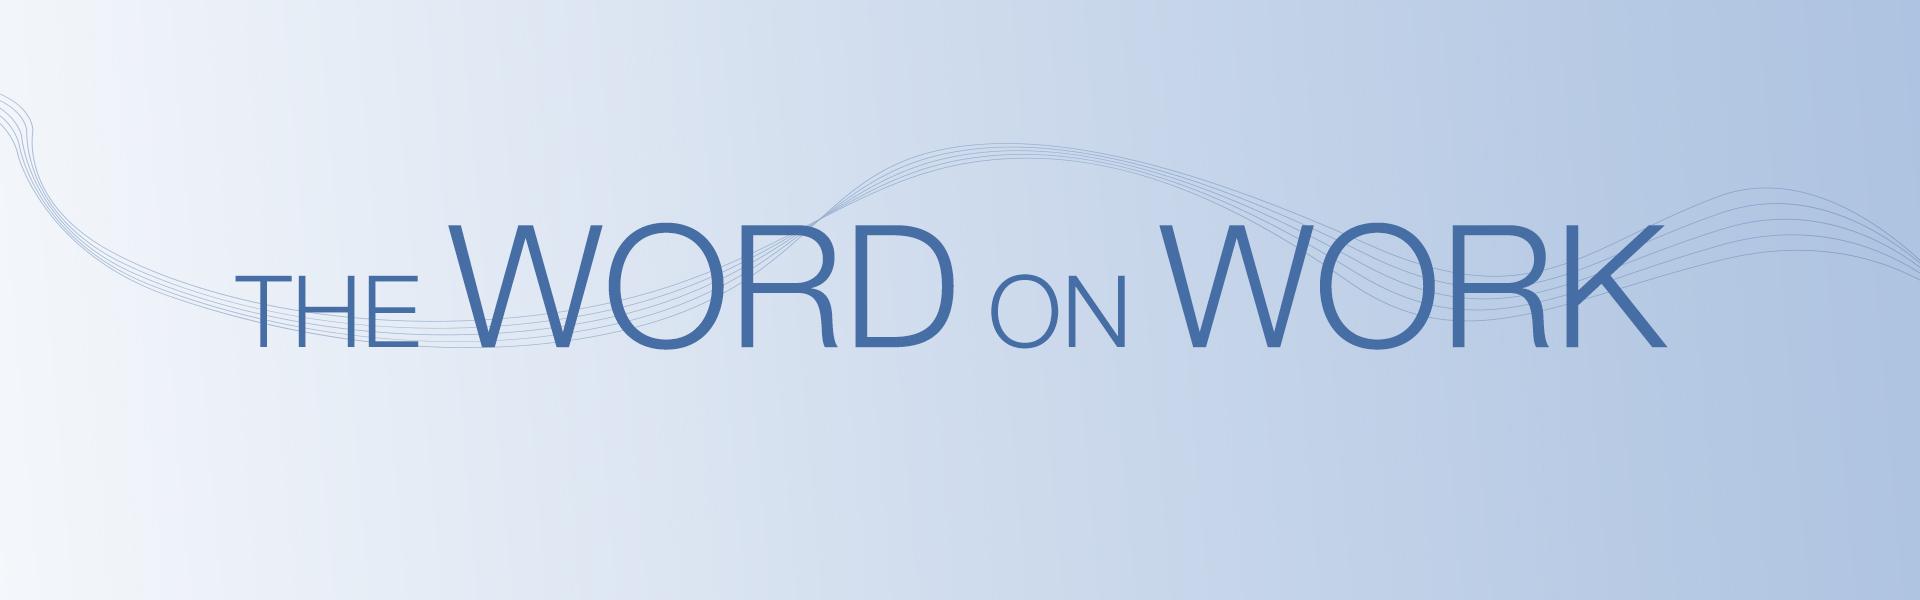 the word on work manpowergroup